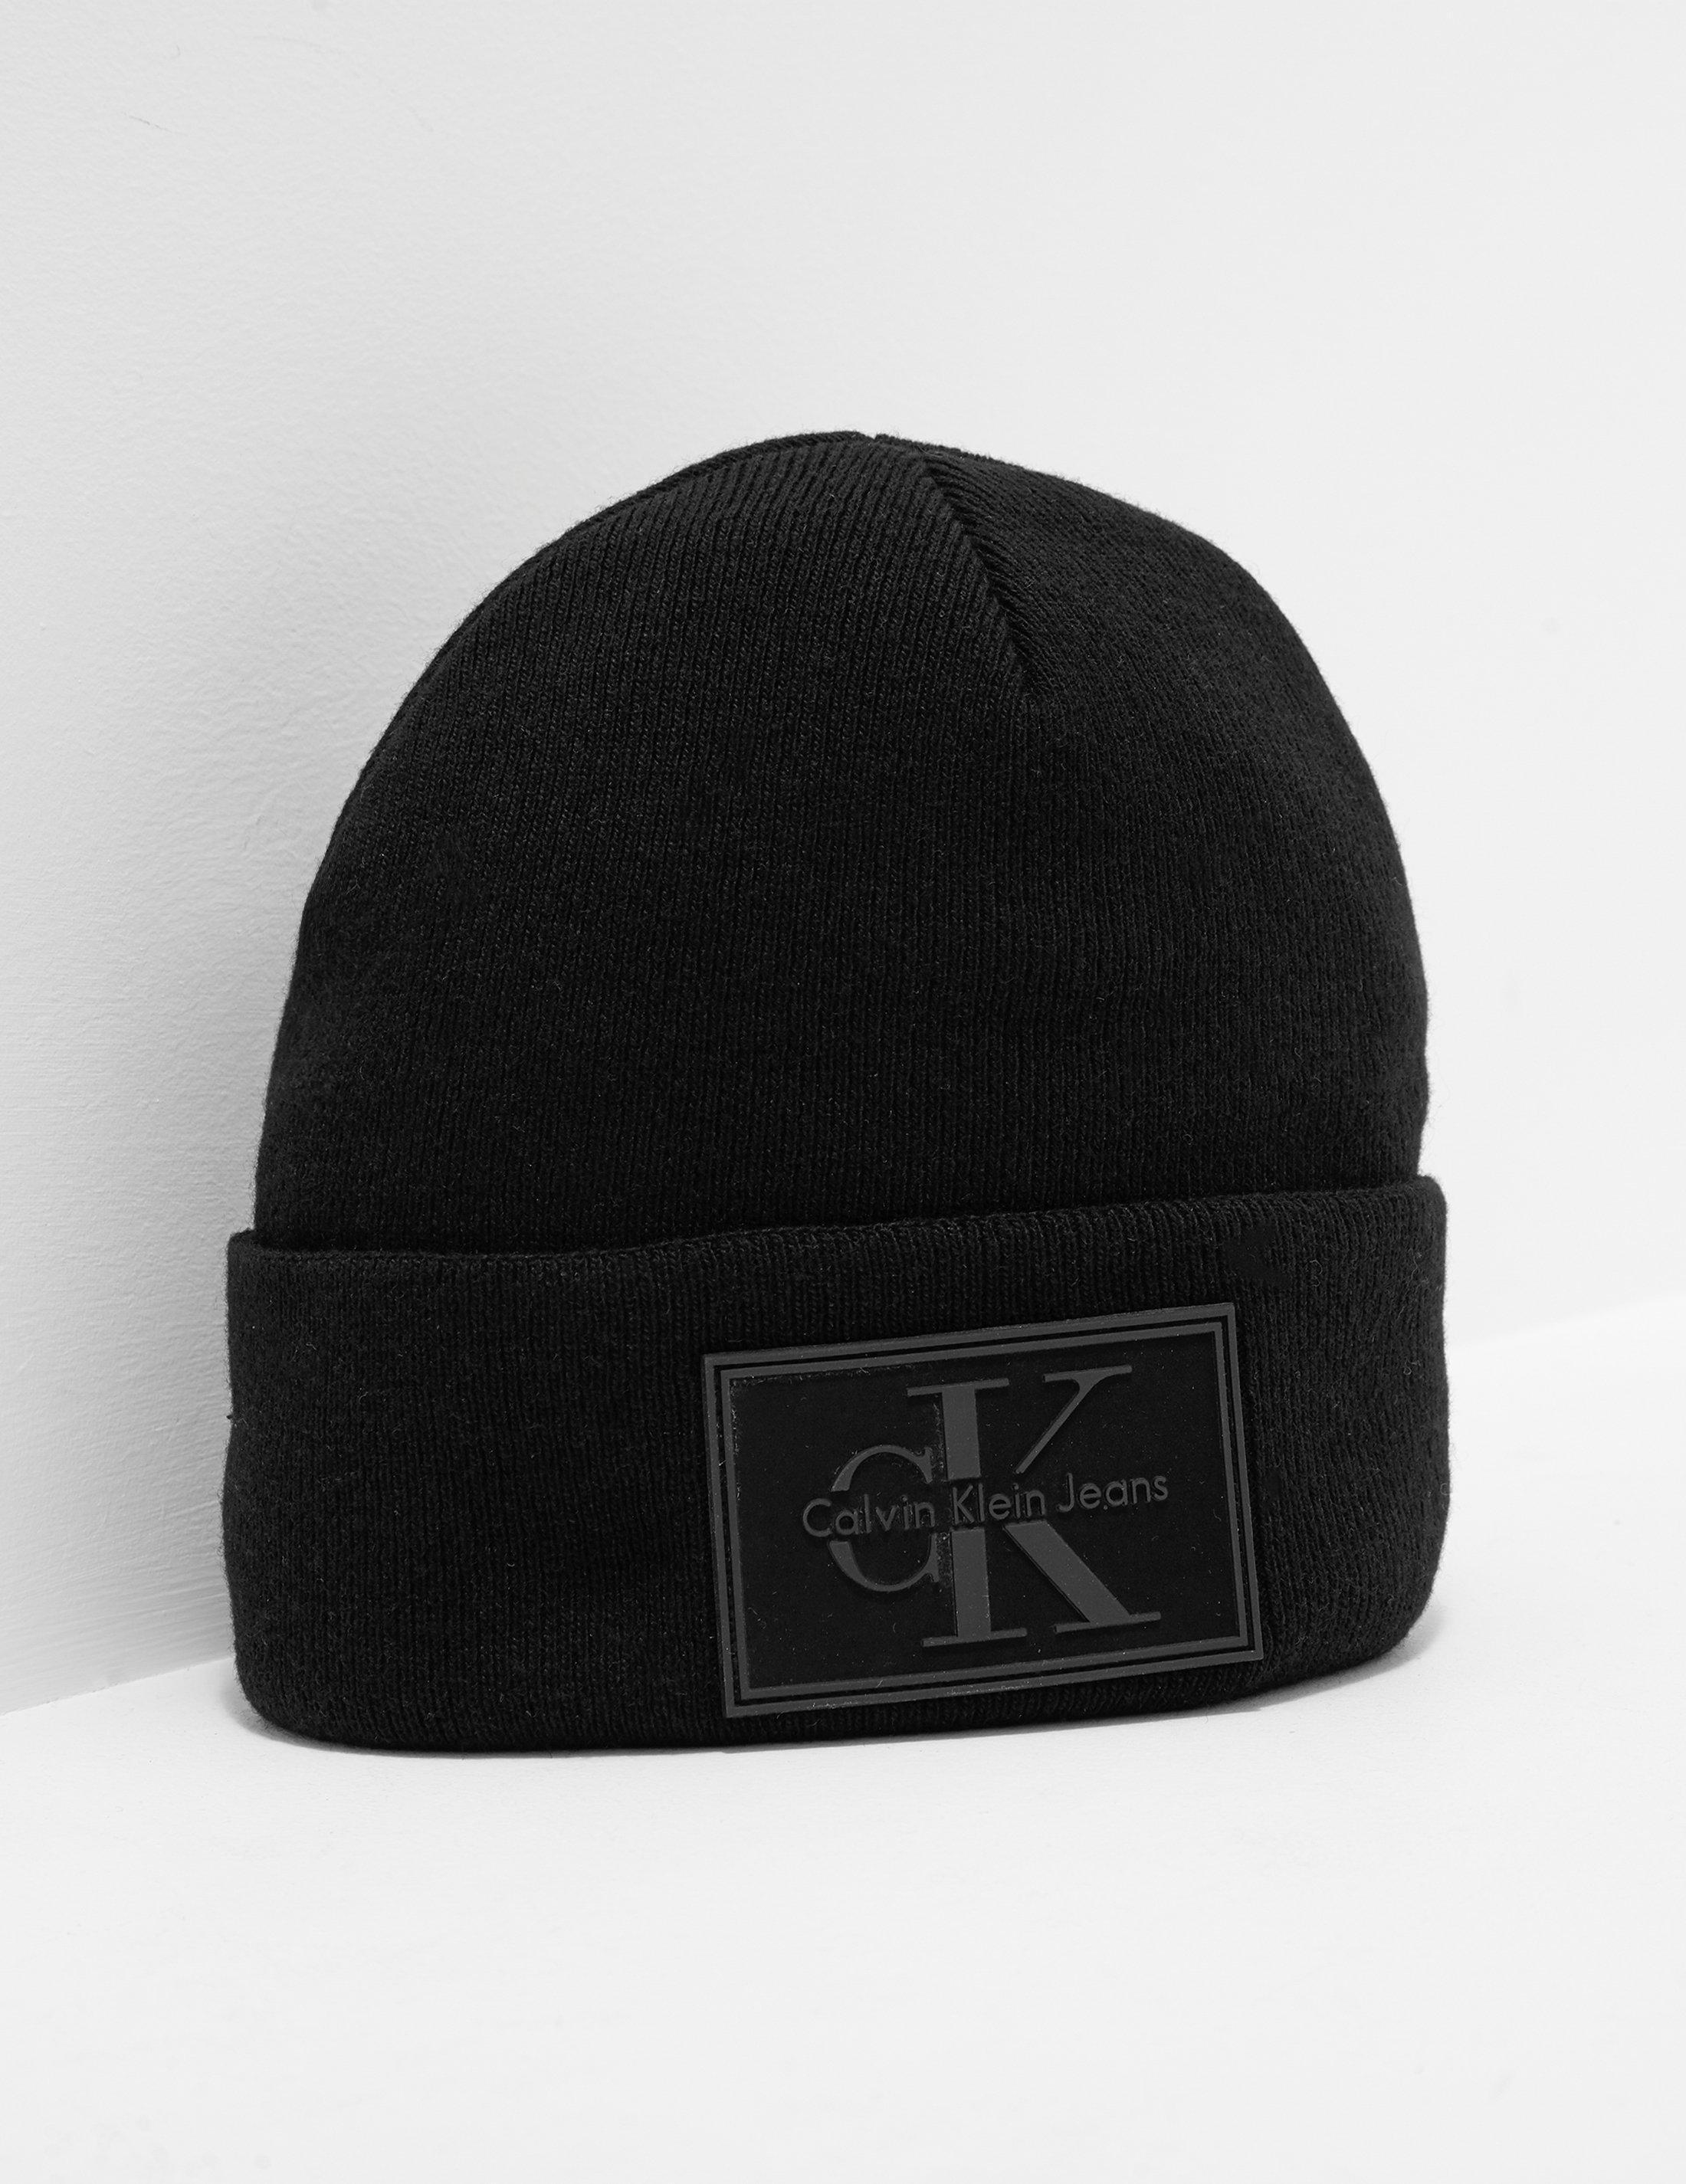 a5313d75 Calvin Klein Mens Reissue Knitted Beanie Black in Black for Men - Lyst